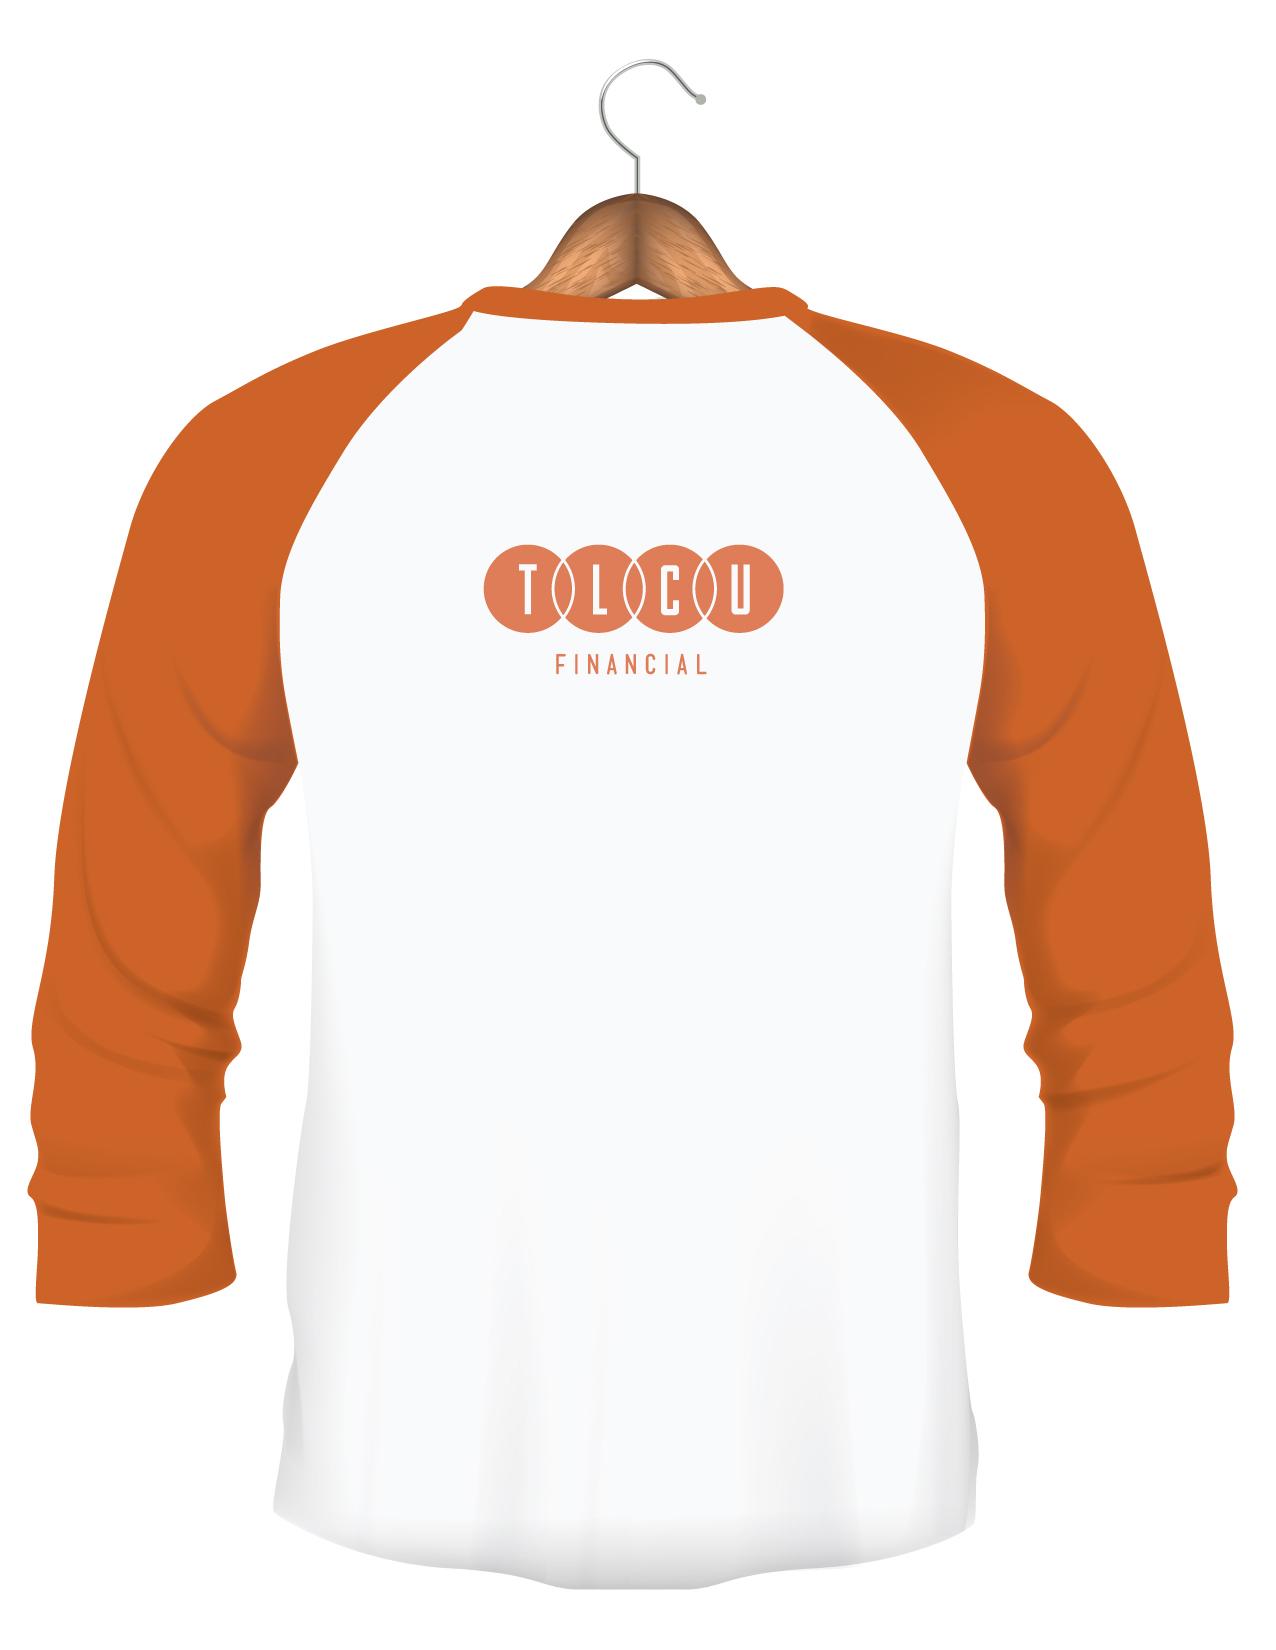 back of credit union t-shirt